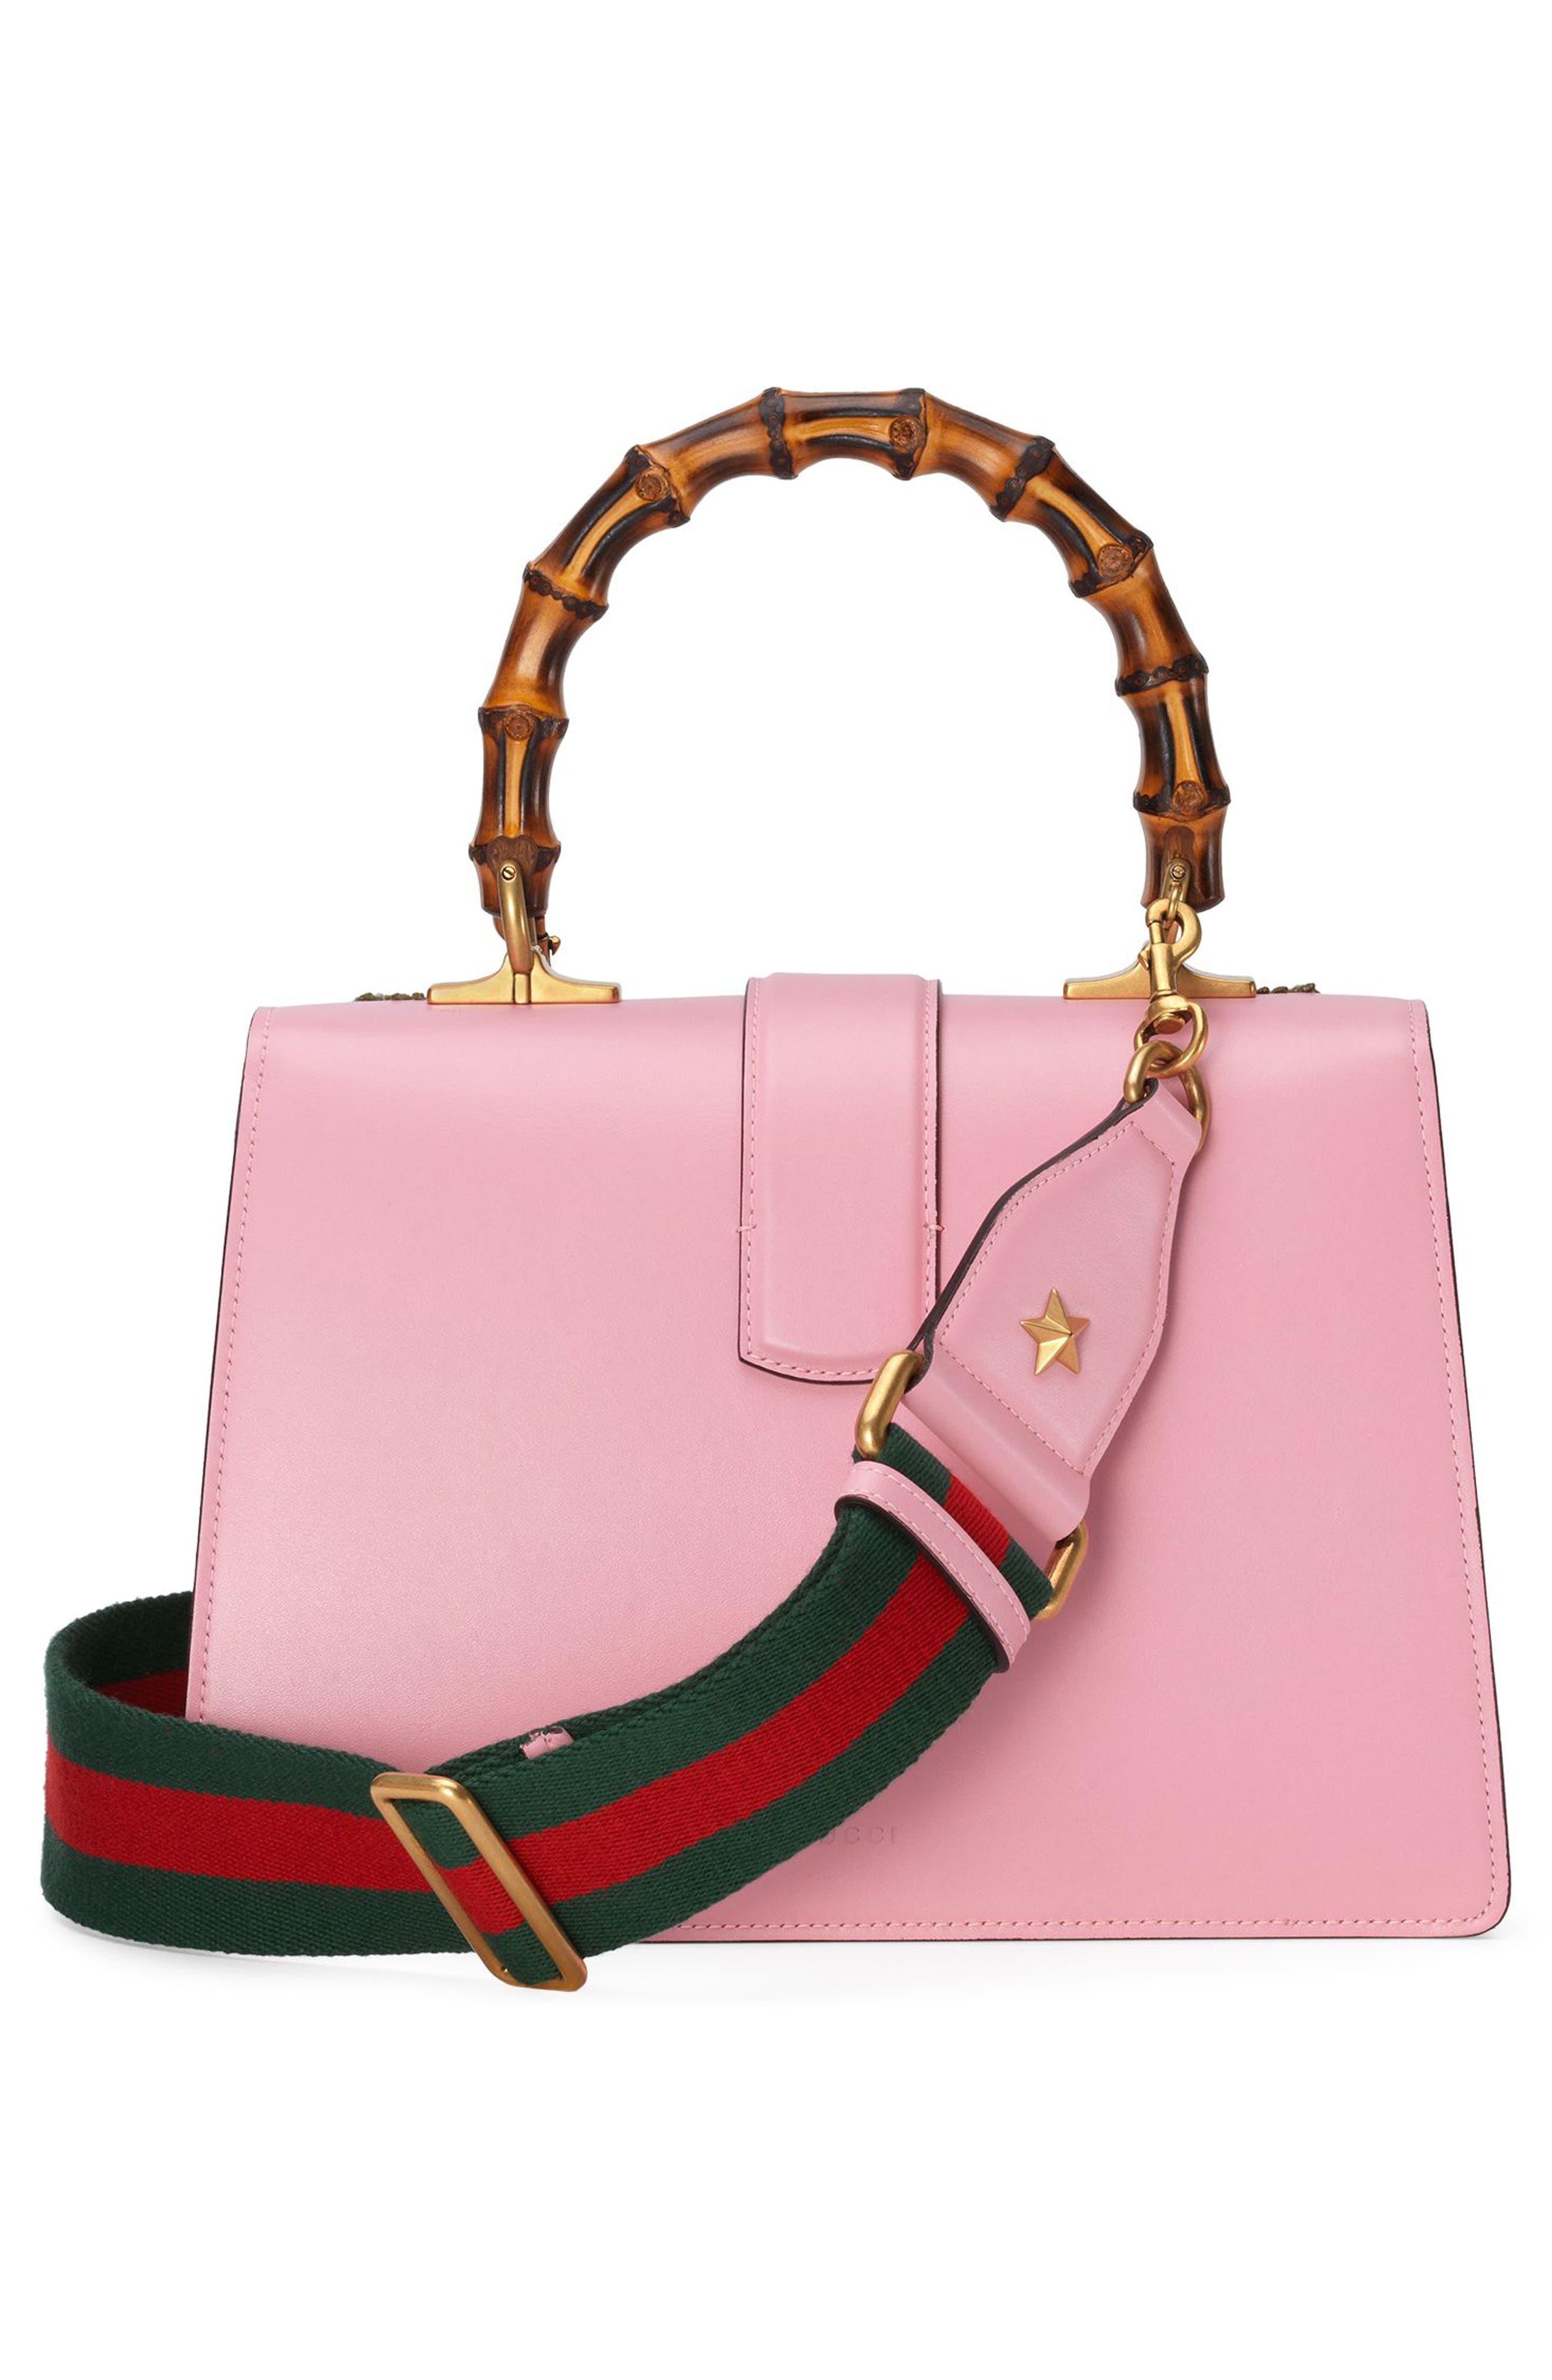 Small Dionysus Top Handle Leather Shoulder Bag,                             Alternate thumbnail 2, color,                             Sugar Pink/Multi